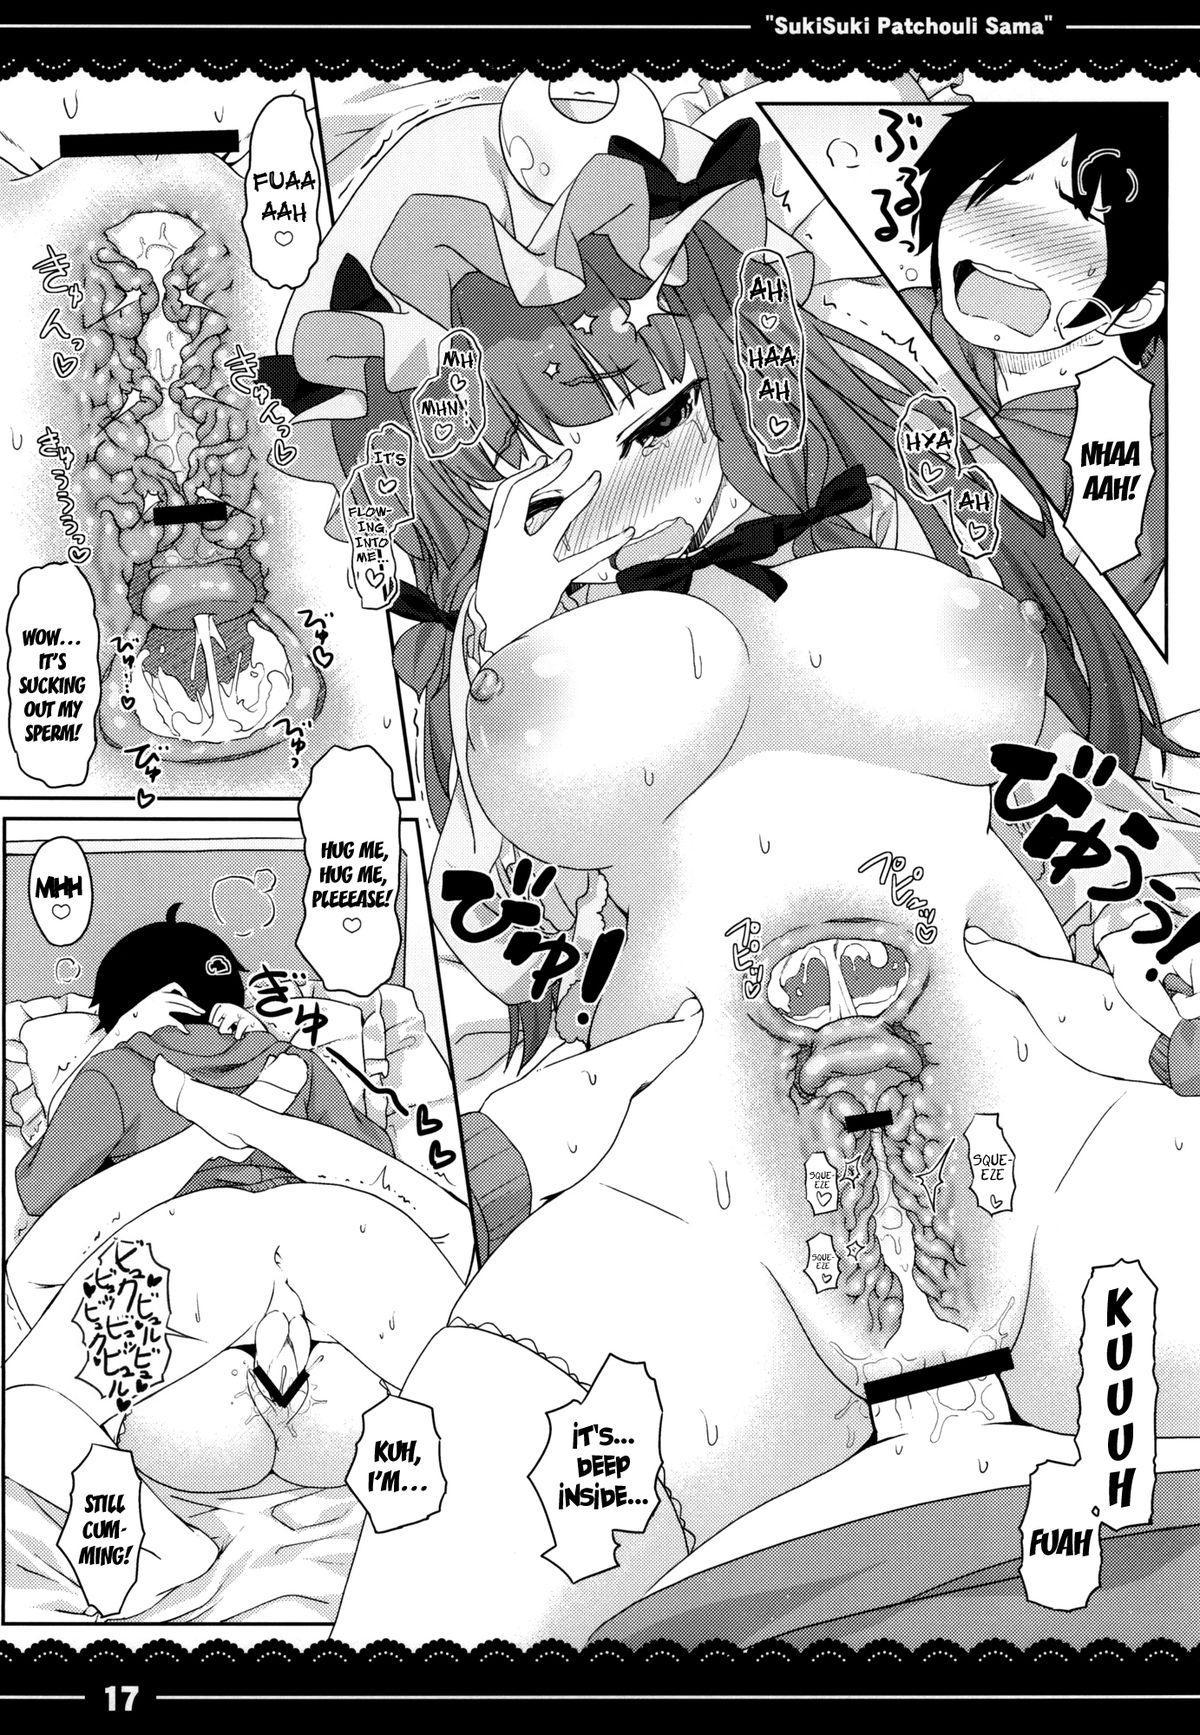 (Reitaisai 10) [Itou Life] Suki Suki! Patchouli-sama | I Really Like You! Patchouli-sama (Touhou Project) [English] {doujin-moe.us} 17